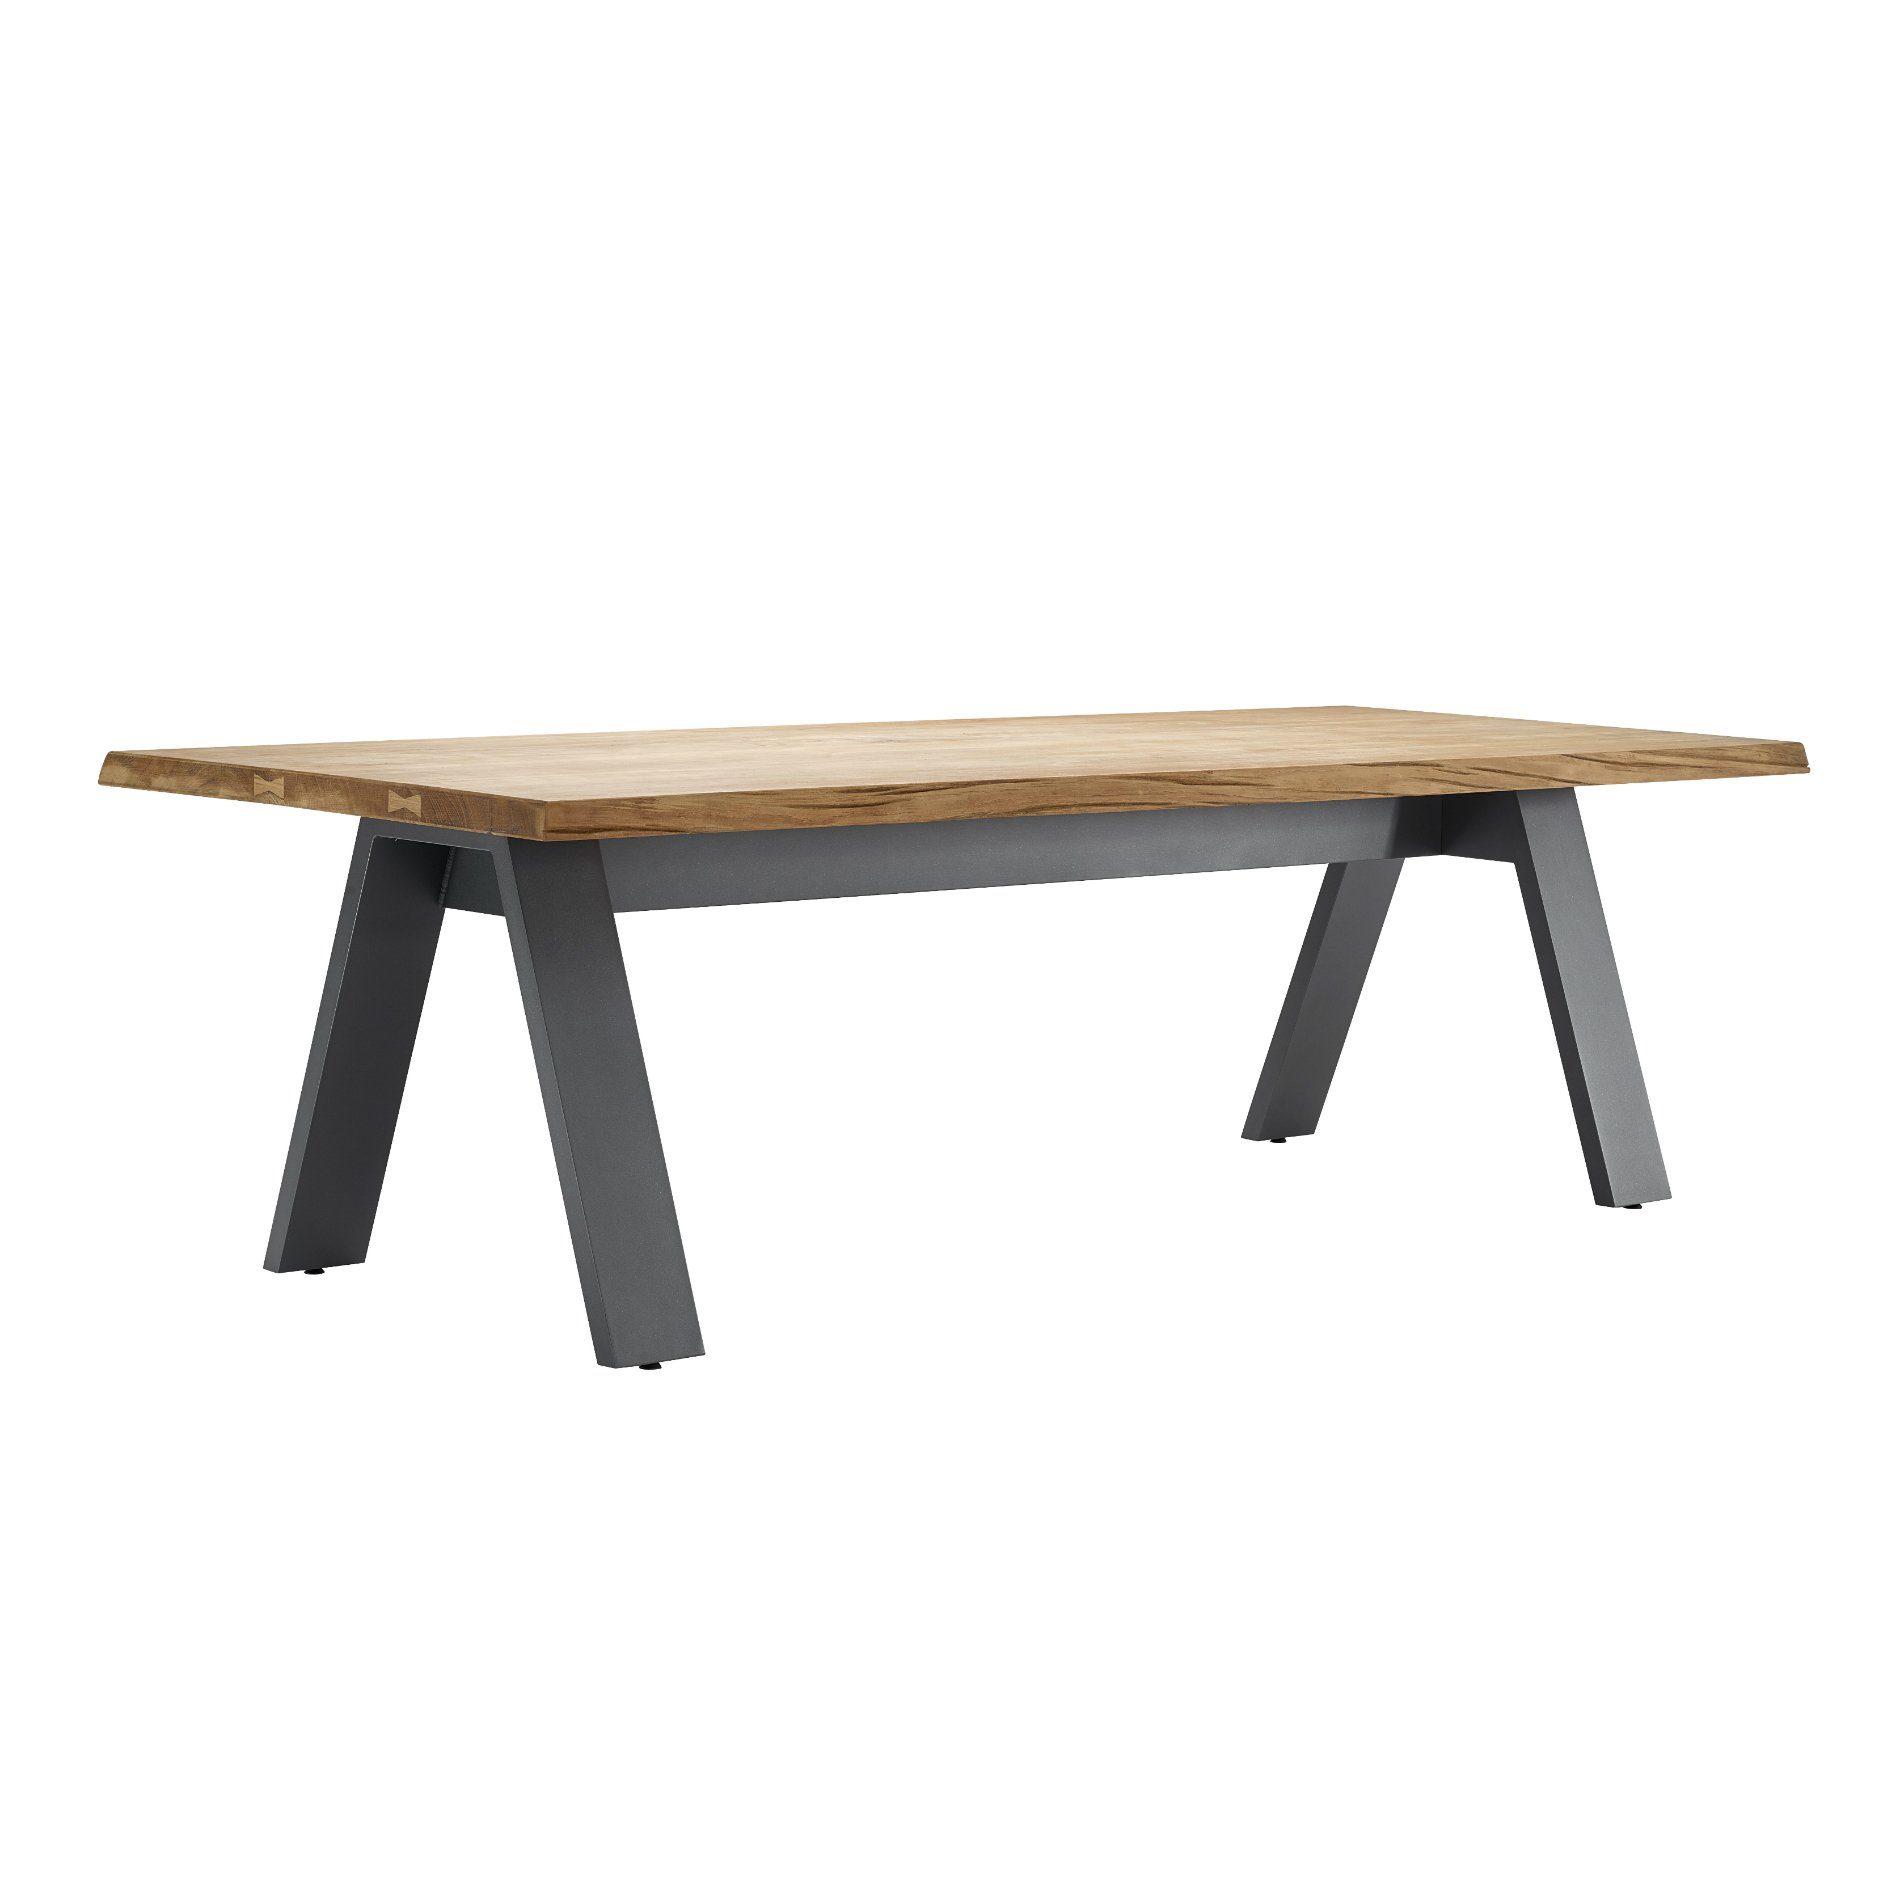 Solpuri timber gartentisch aluminium teakholz for Gartentisch aluminium